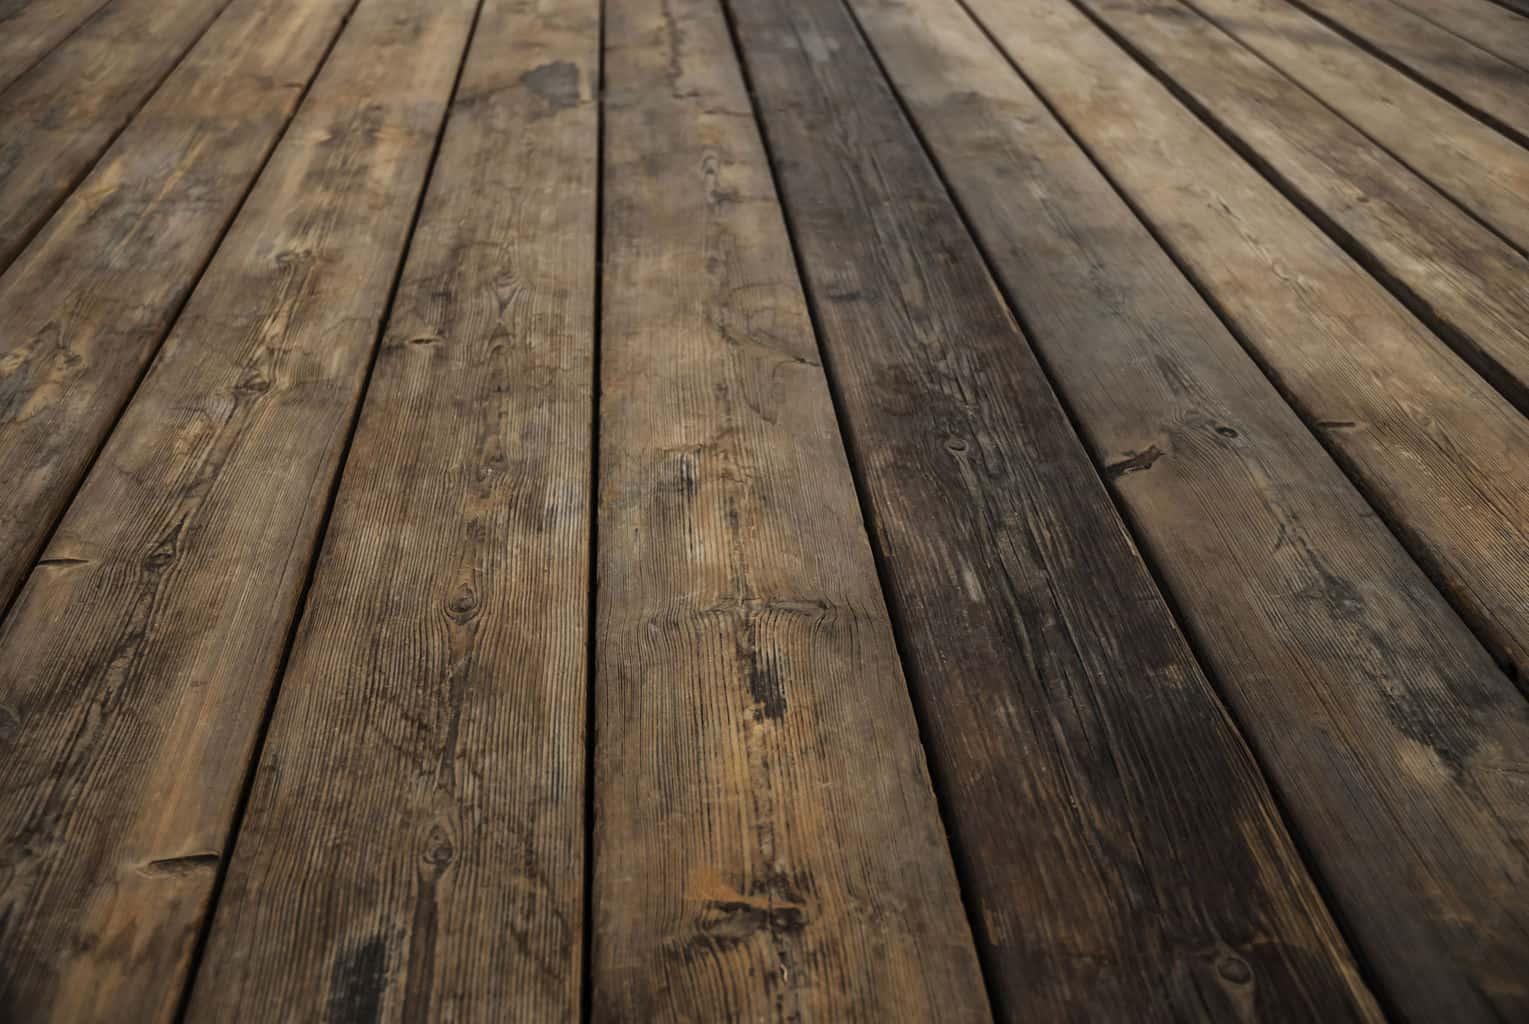 Victorian Wallpaper Black Pine Wood Flooring The Best In Business Theflooringlady